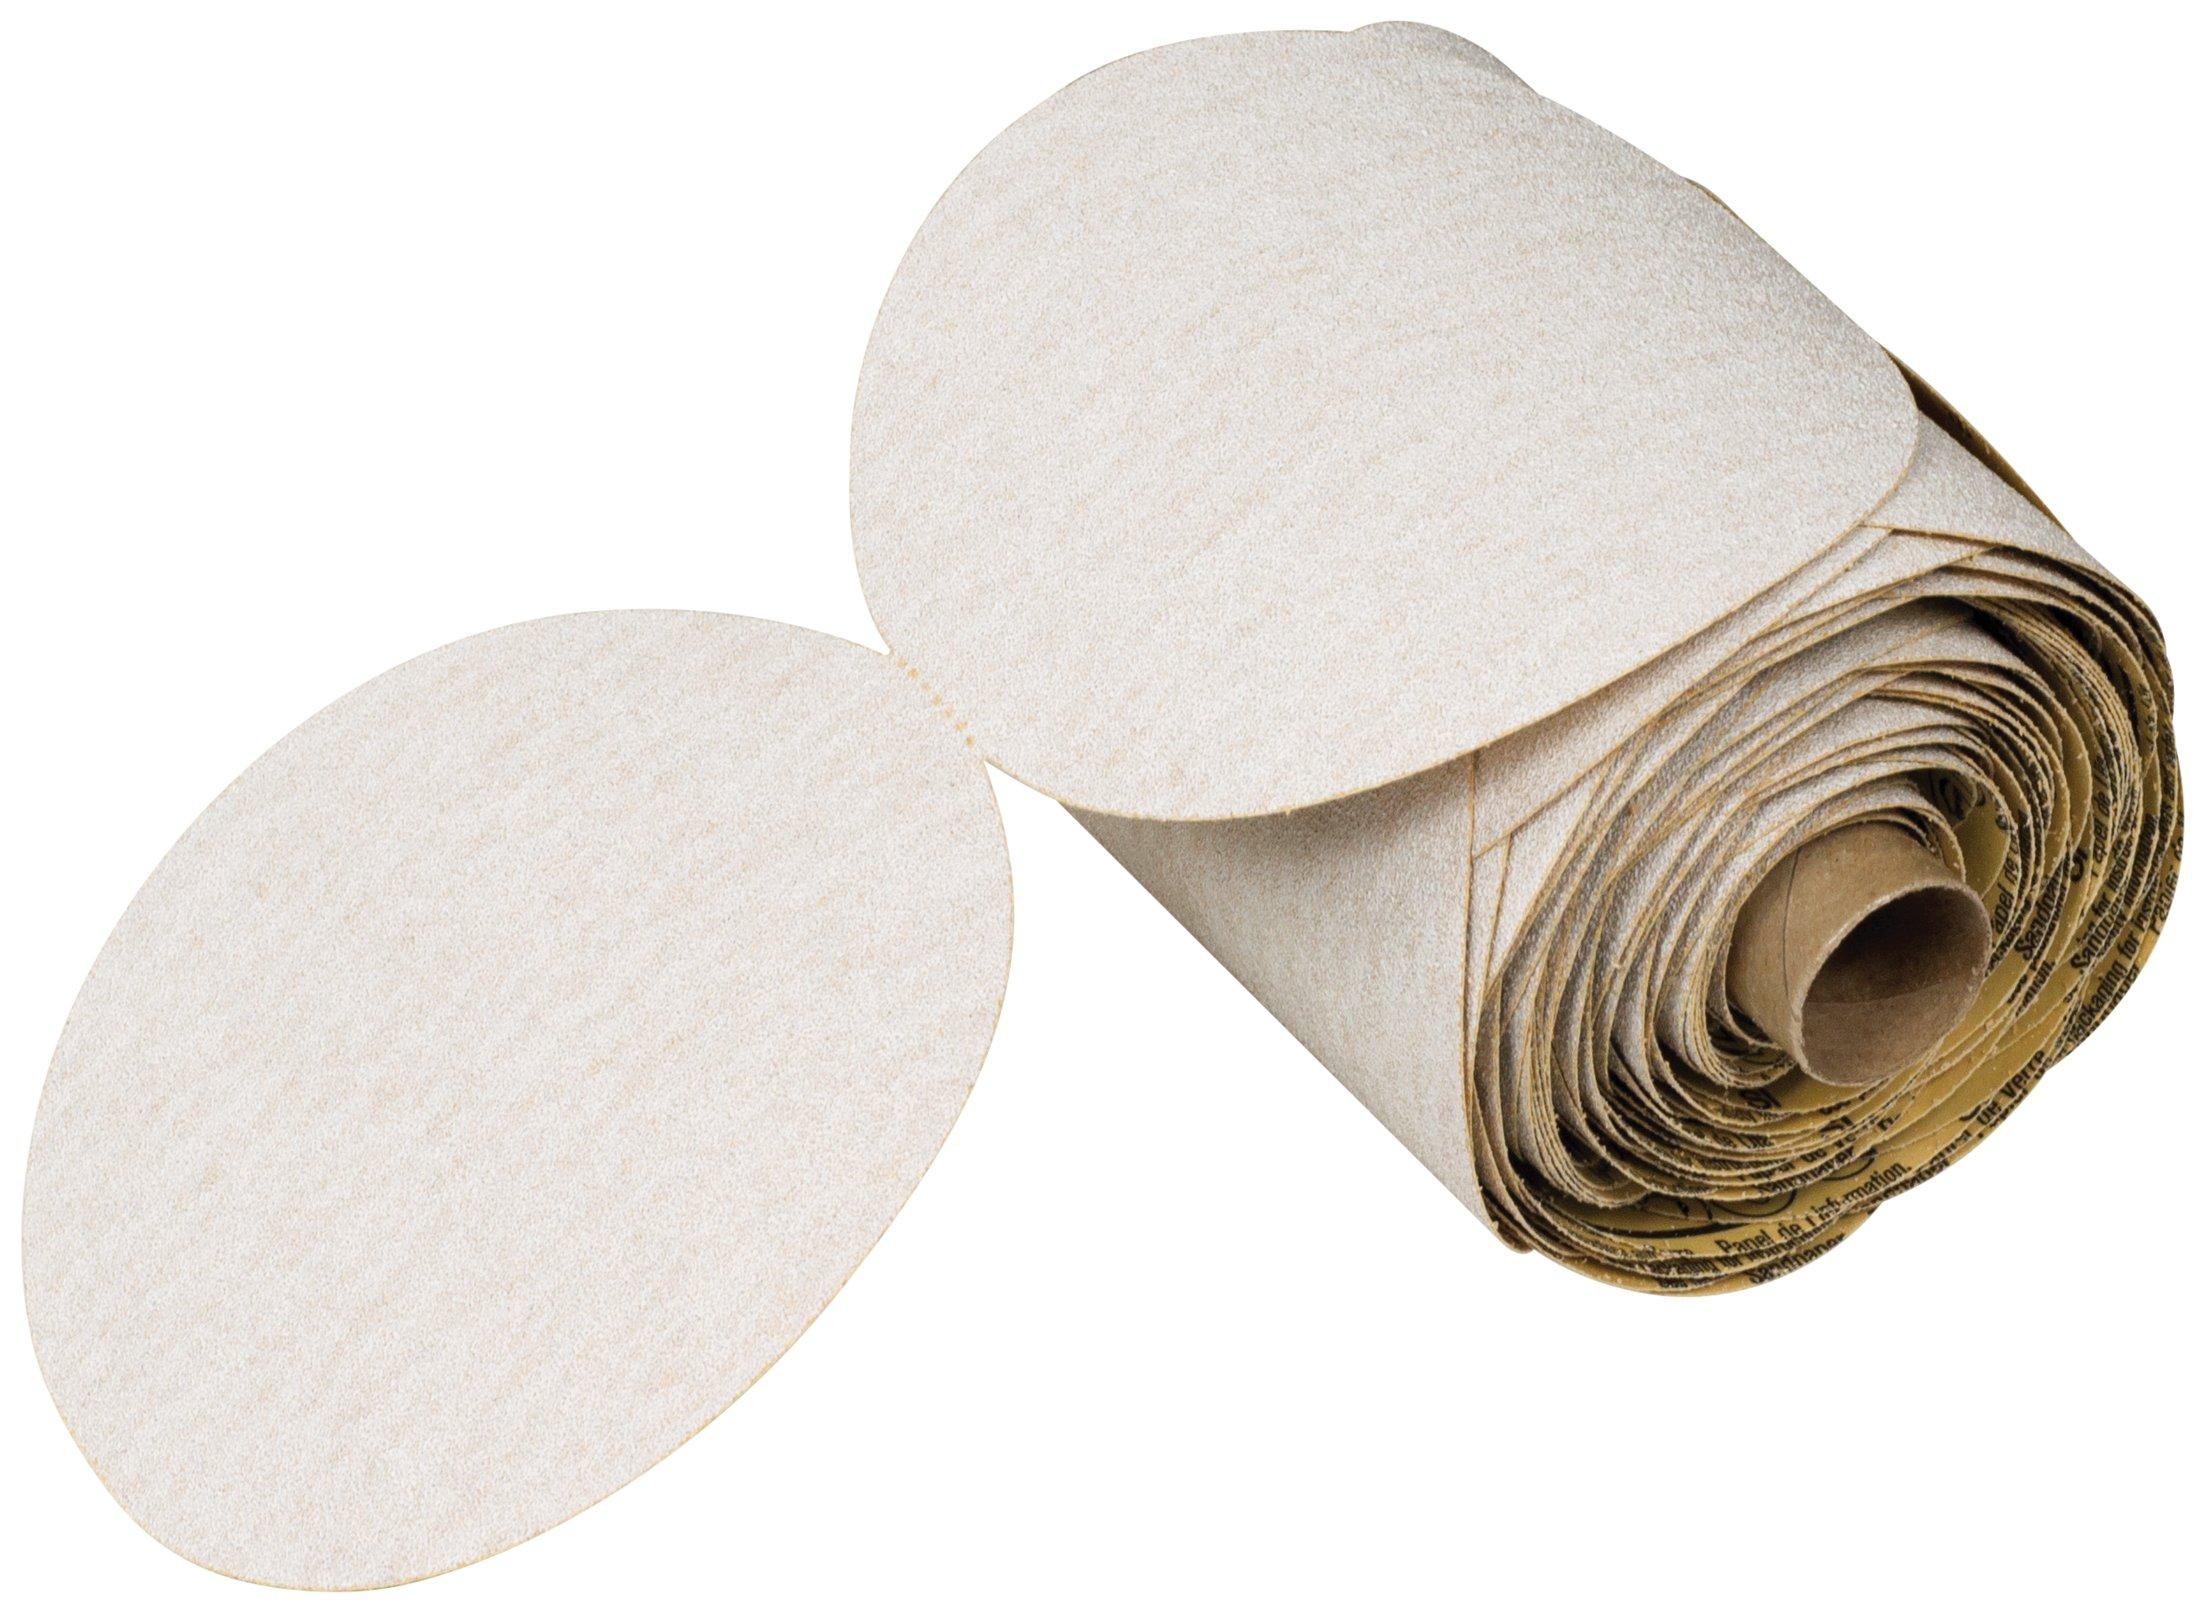 3M NX PSA Paper Disc Roll, Aluminum Oxide, 6'' Diameter, P180 Grit, White (Roll of 100)